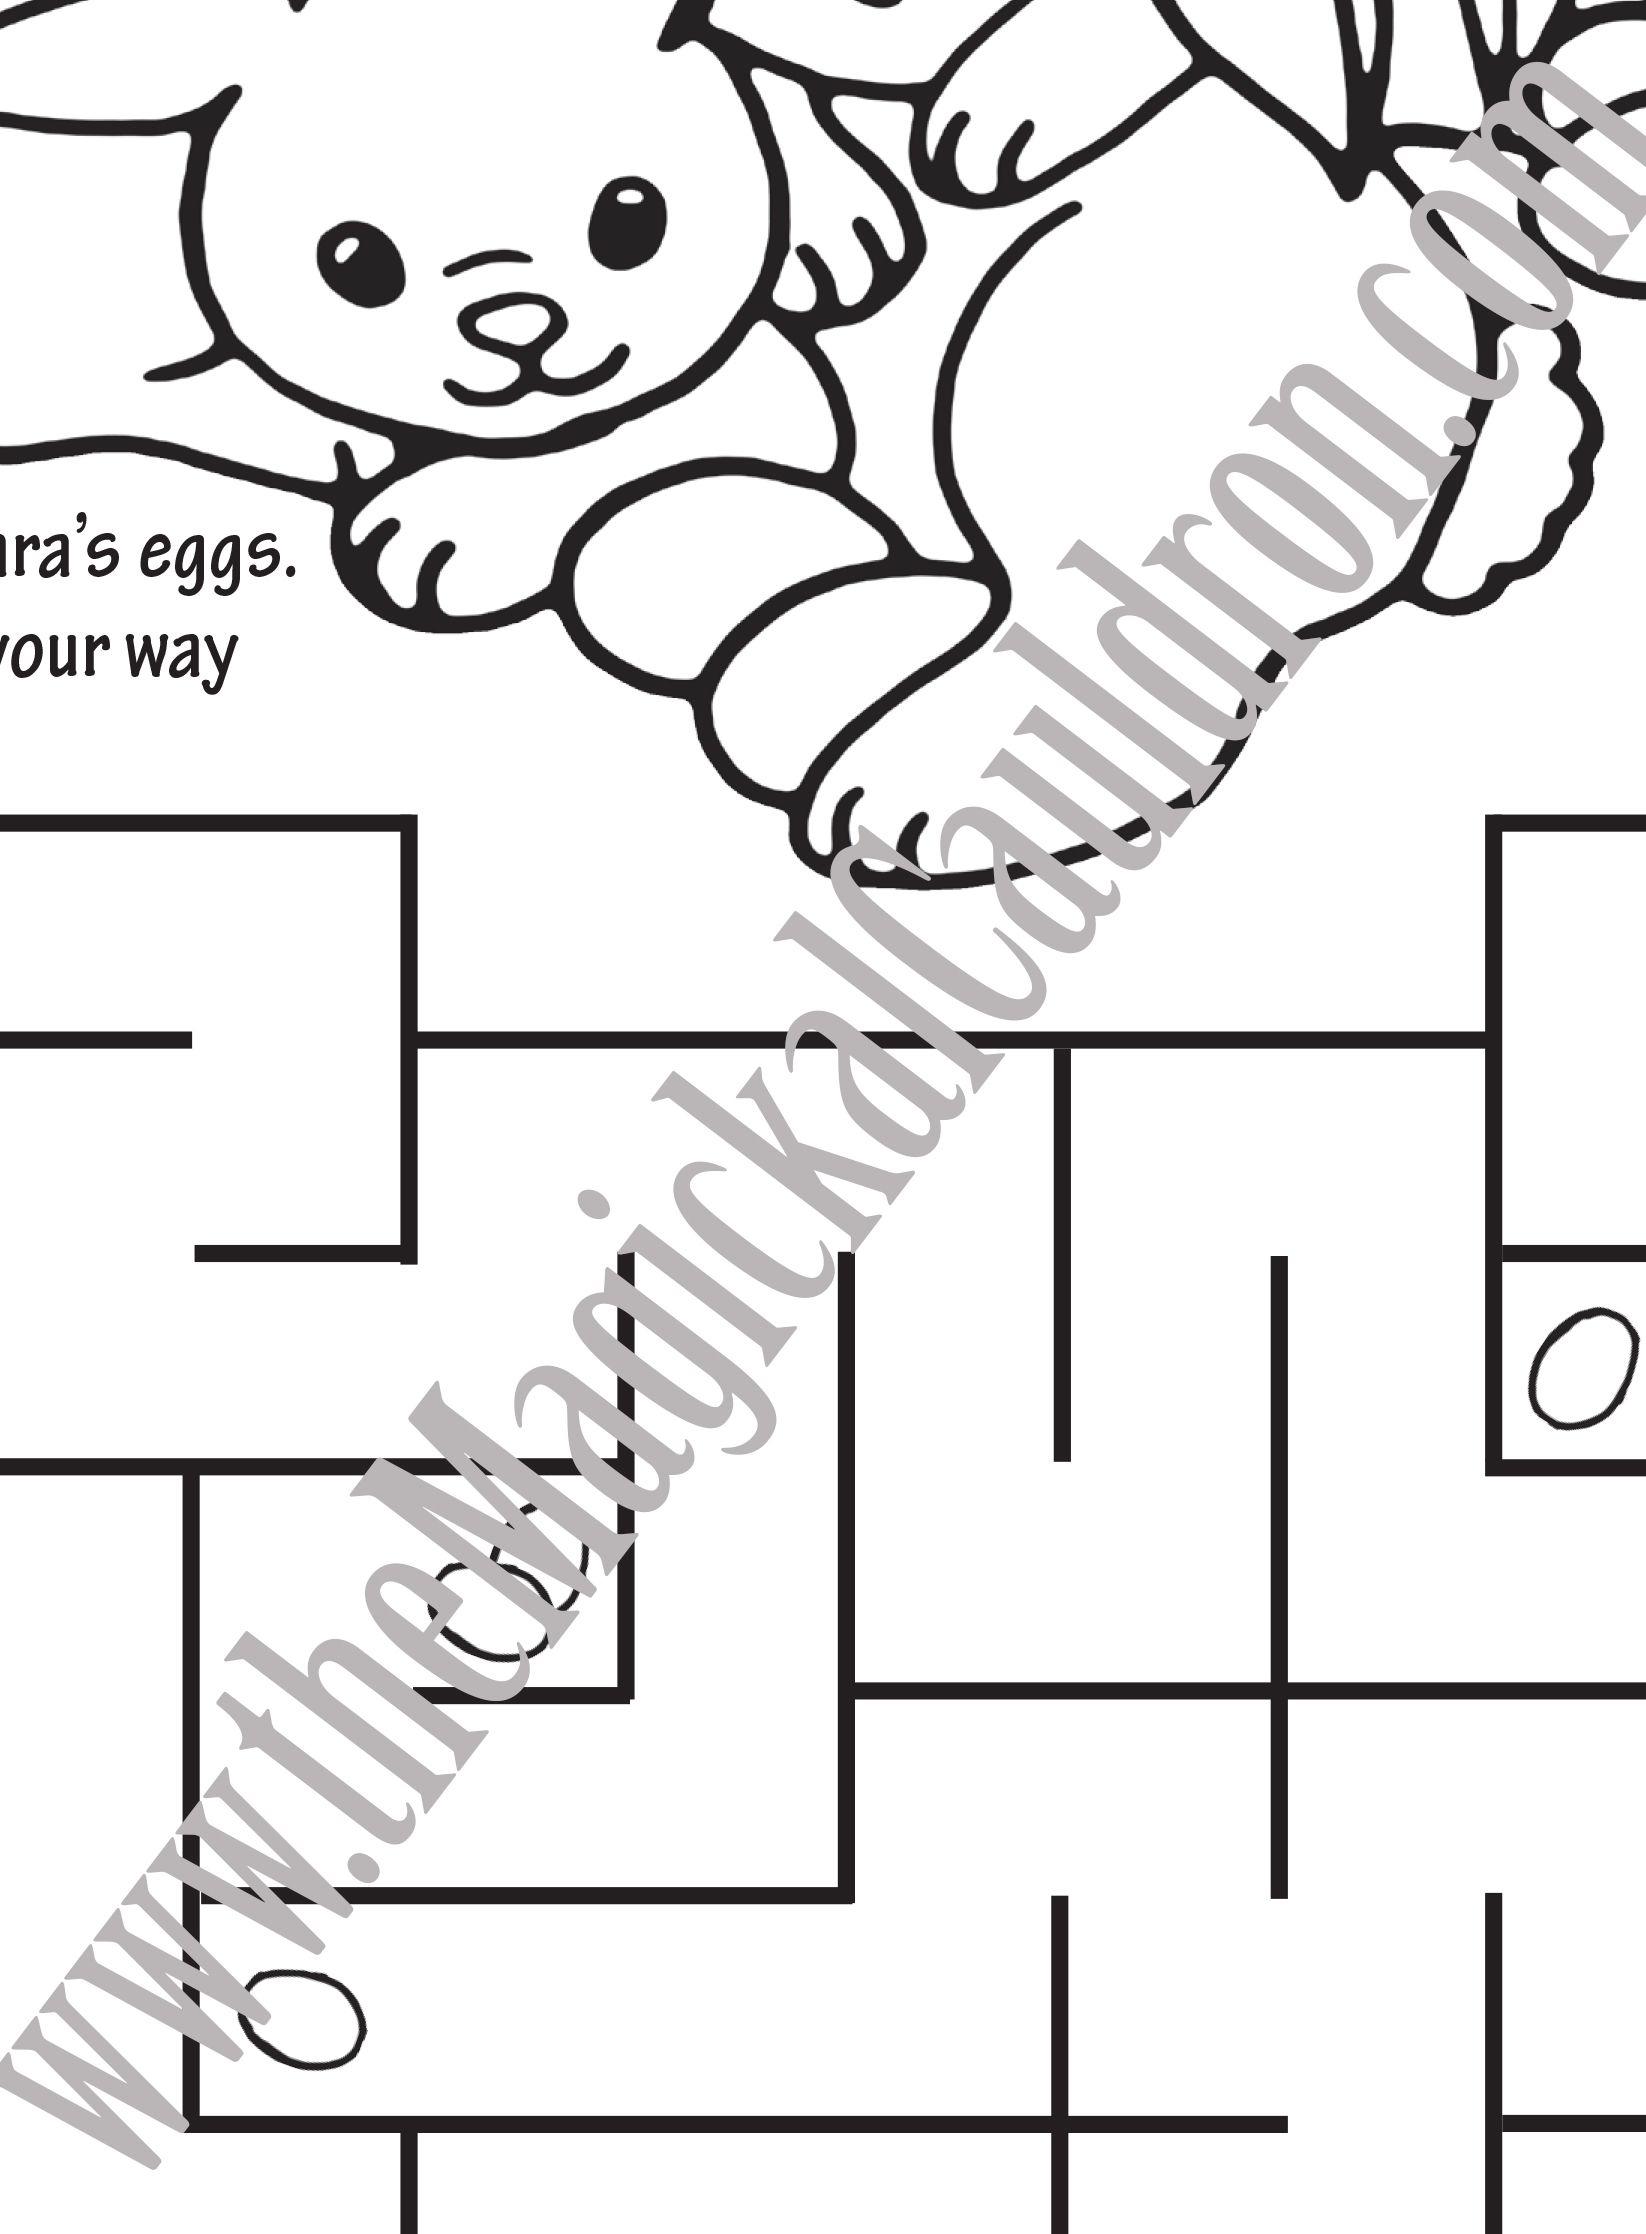 Worksheets For Kids Ostara Spring Equinox Maze Coloring Sheet Worksheets For Kids Spring Fun Spring Equinox